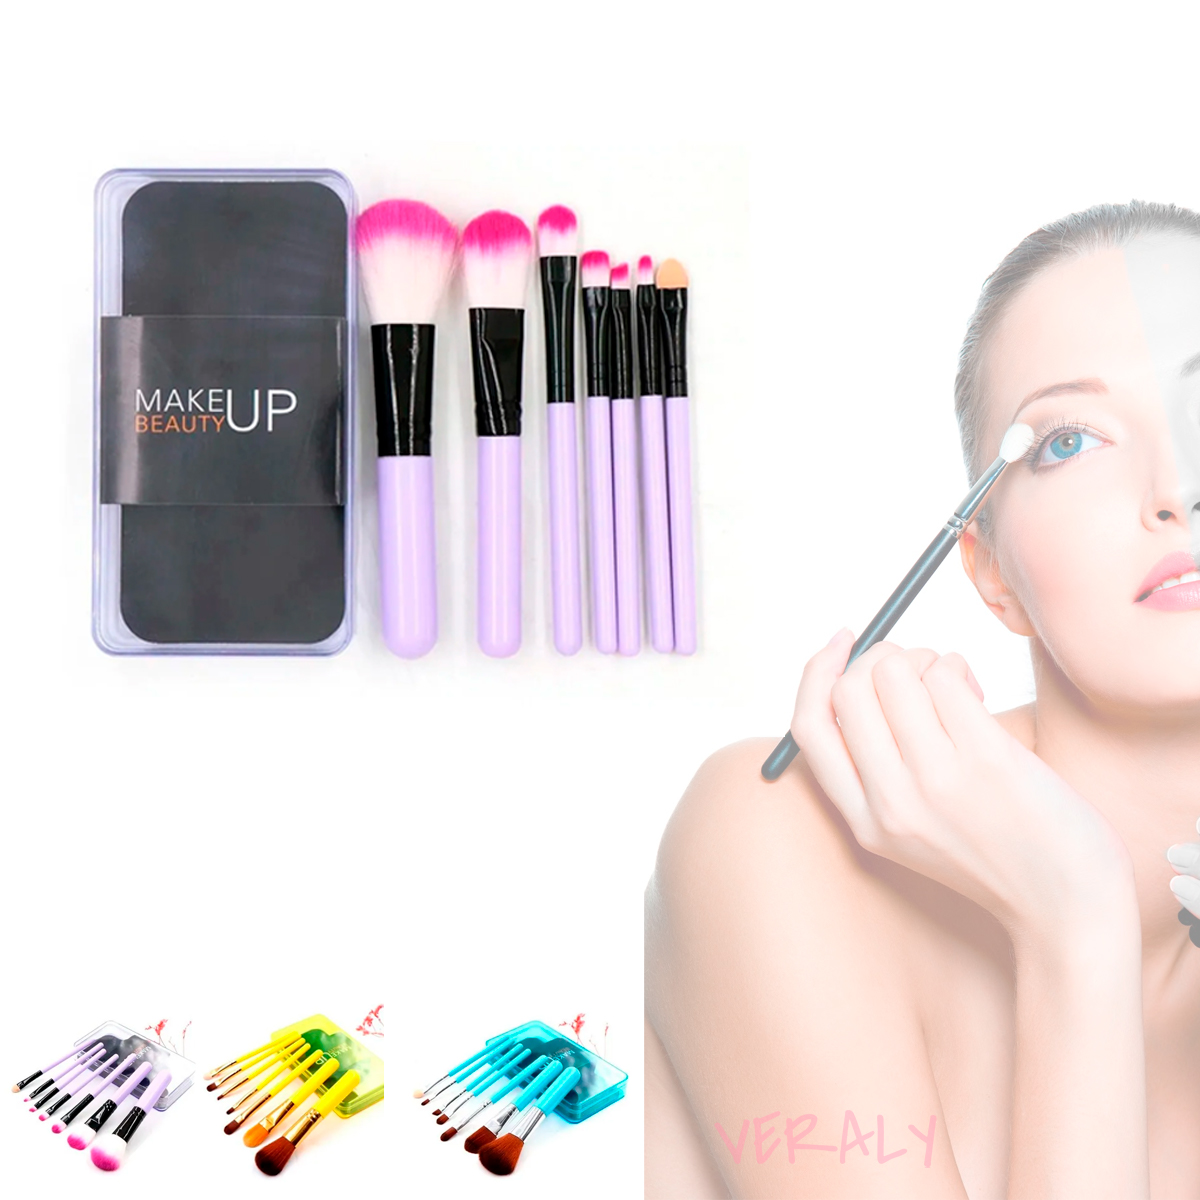 Set De Brochas De Maquillaje 7 Make Up Azul, Rosa, Otras